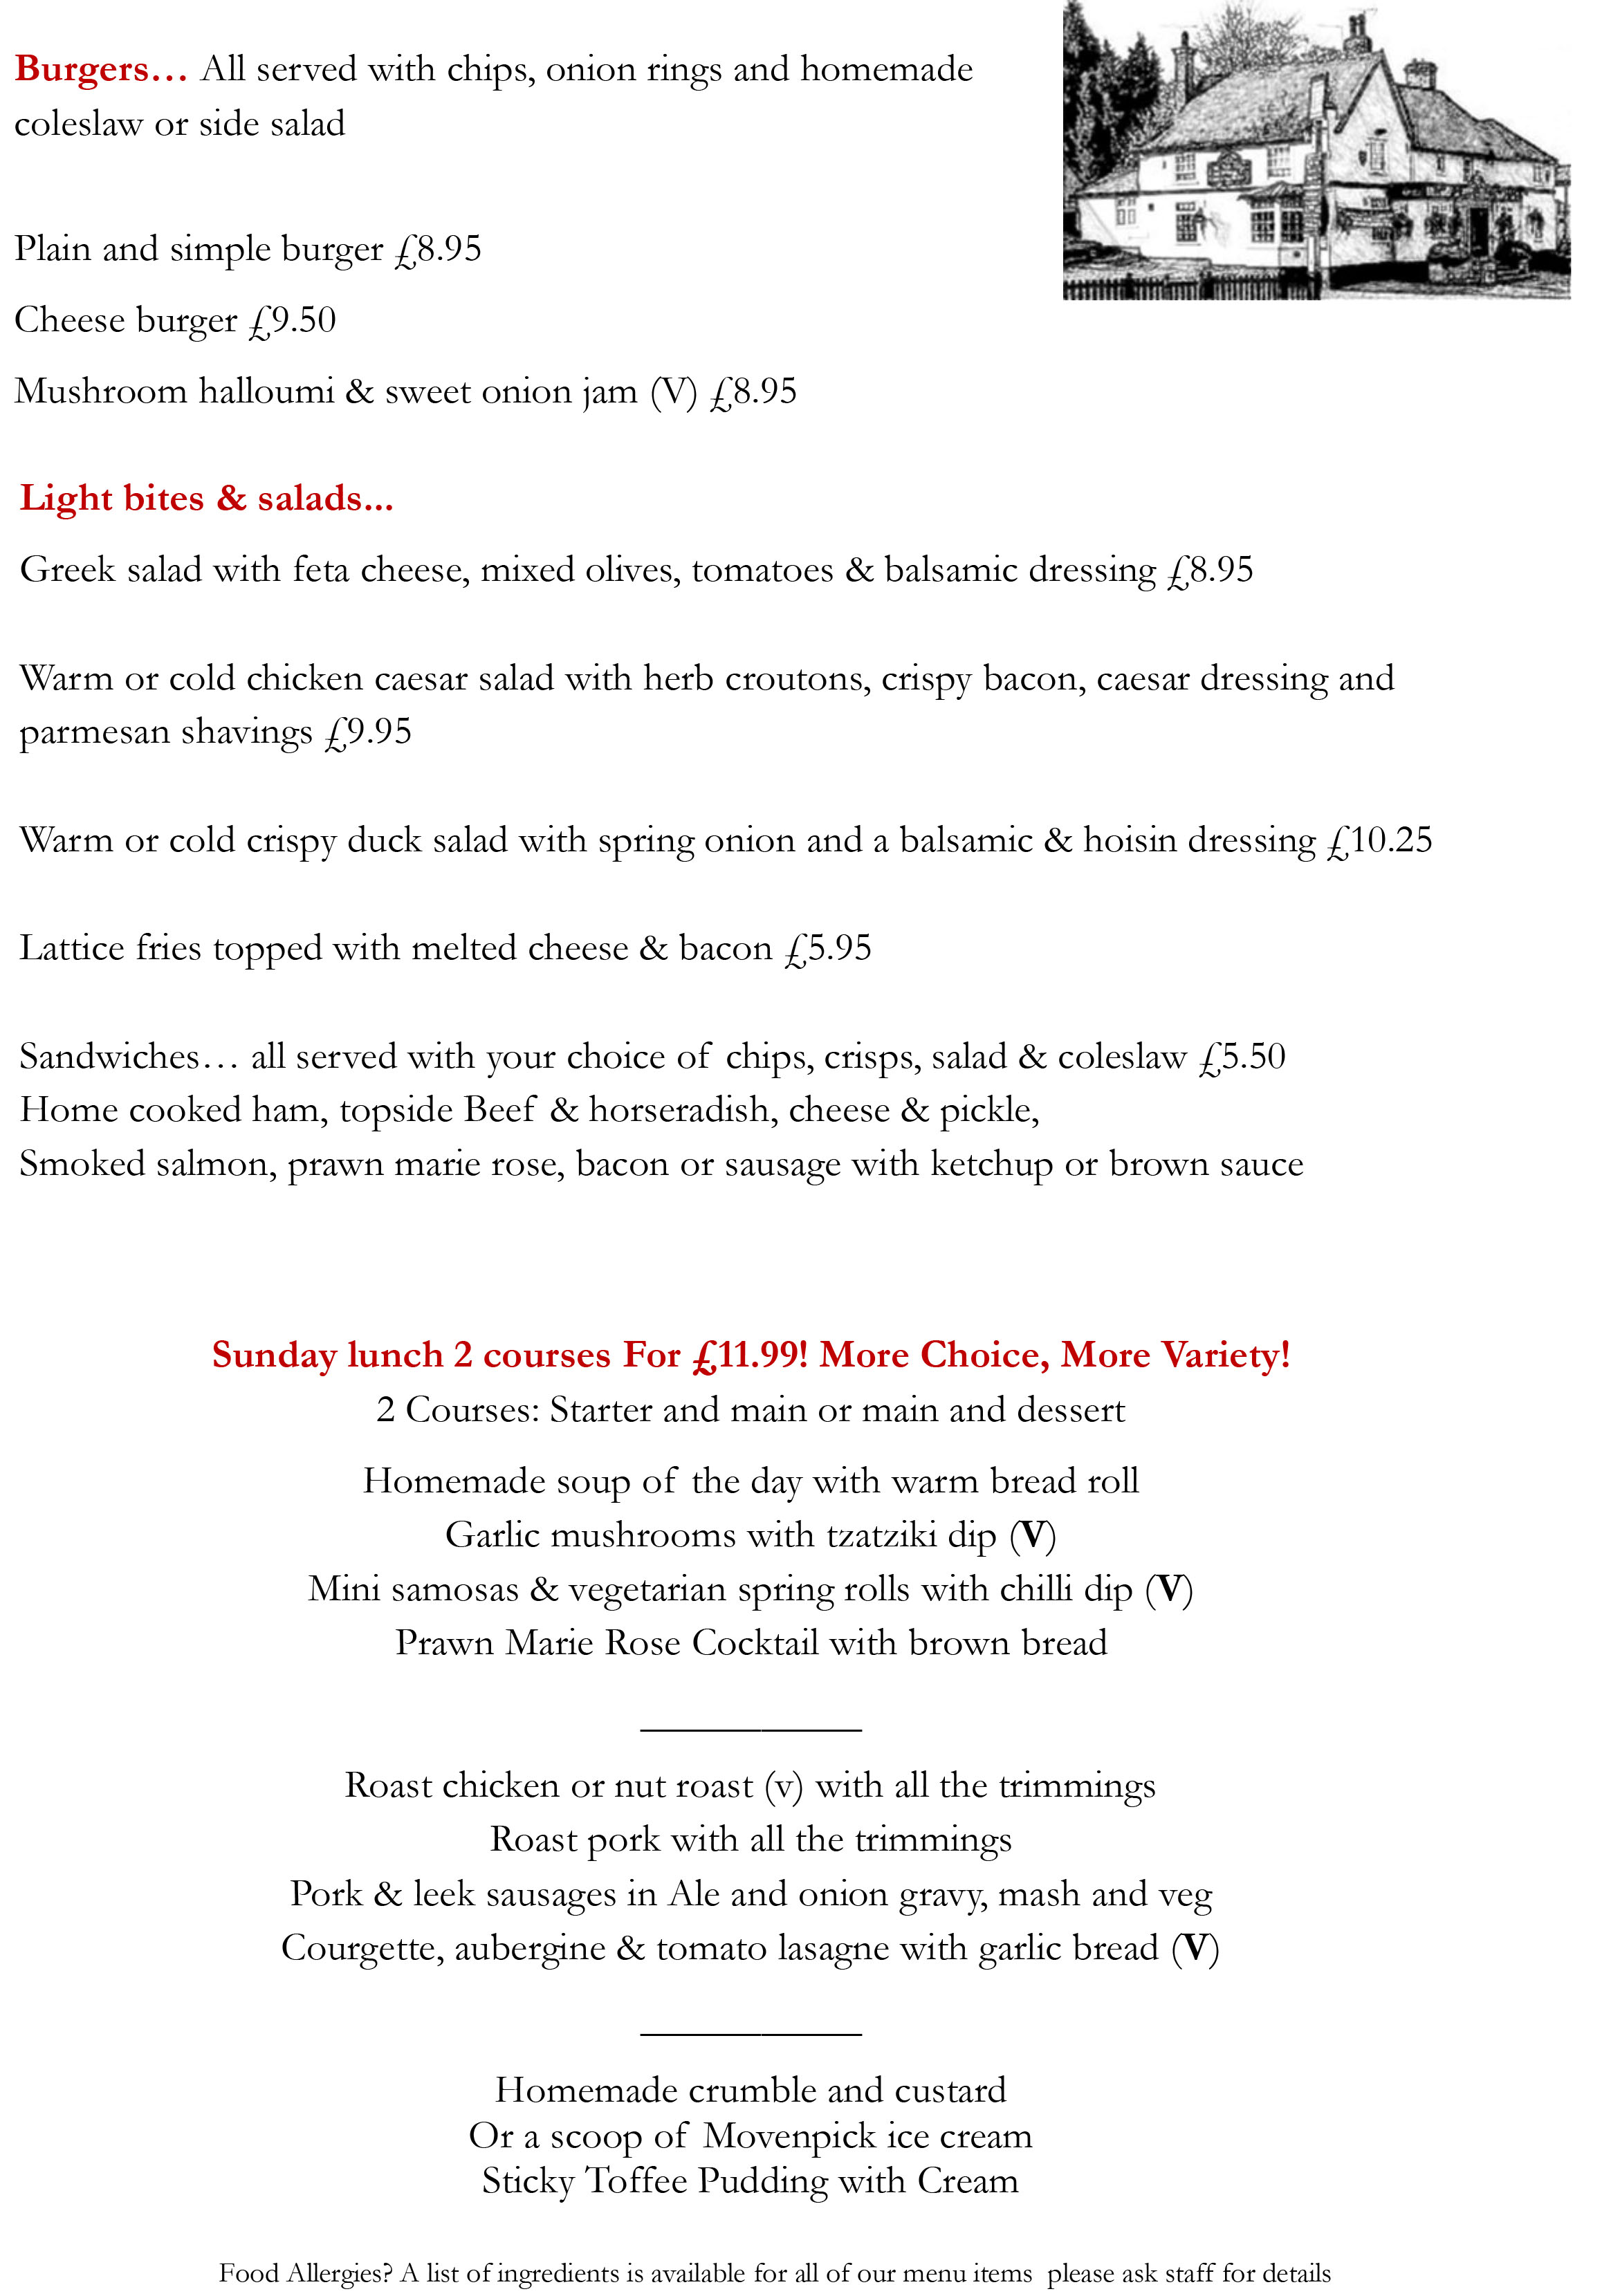 sunday-menu-september1-2